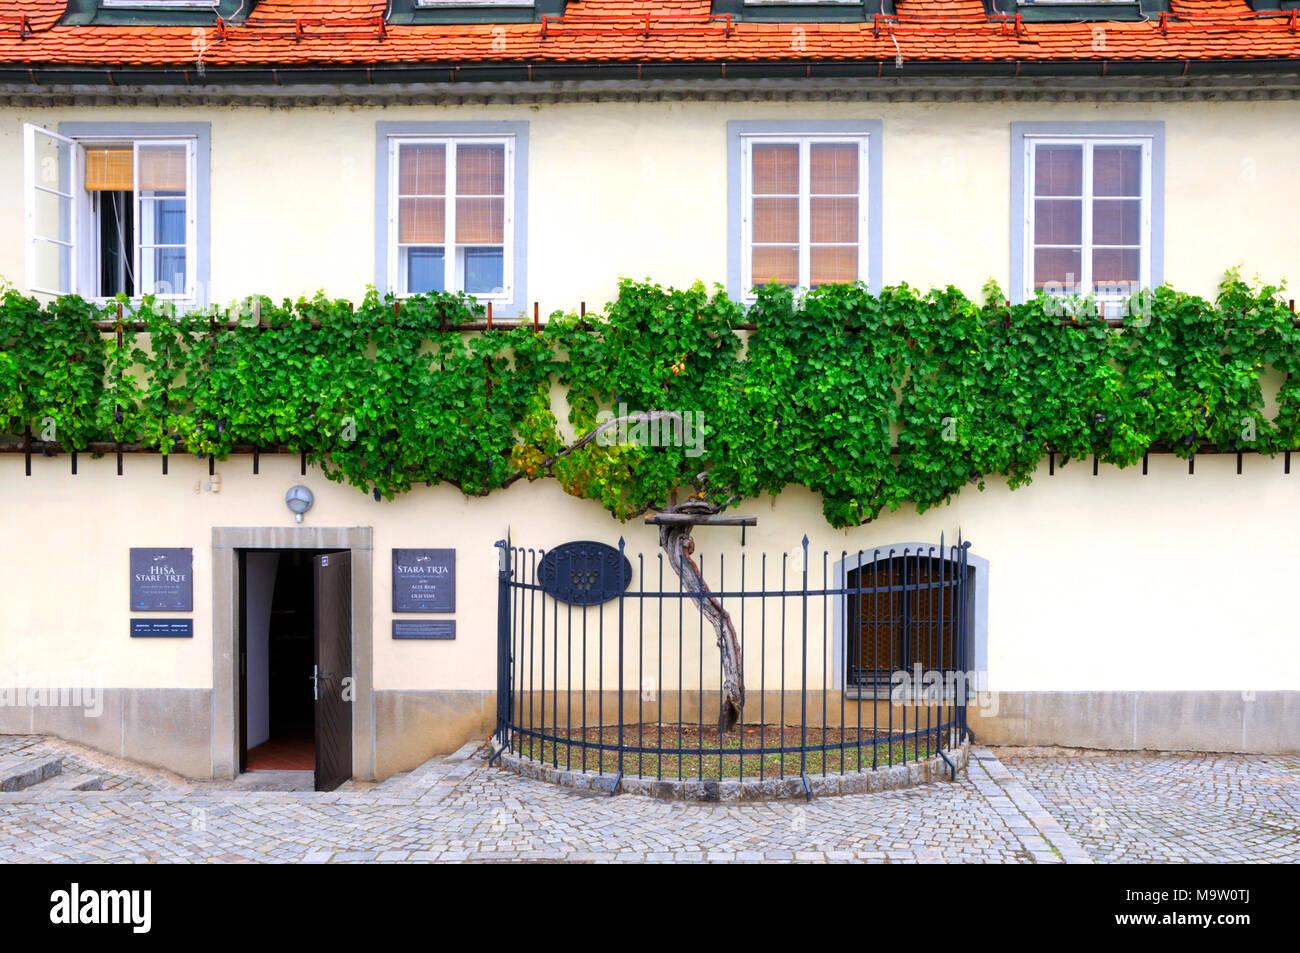 Maribor, Stajerska, Slovenia. Stara trta - Oldest grape vine in the world. Over 400 years old and in Guiness Book of Records. (Zametna crnina, variety Stock Photo